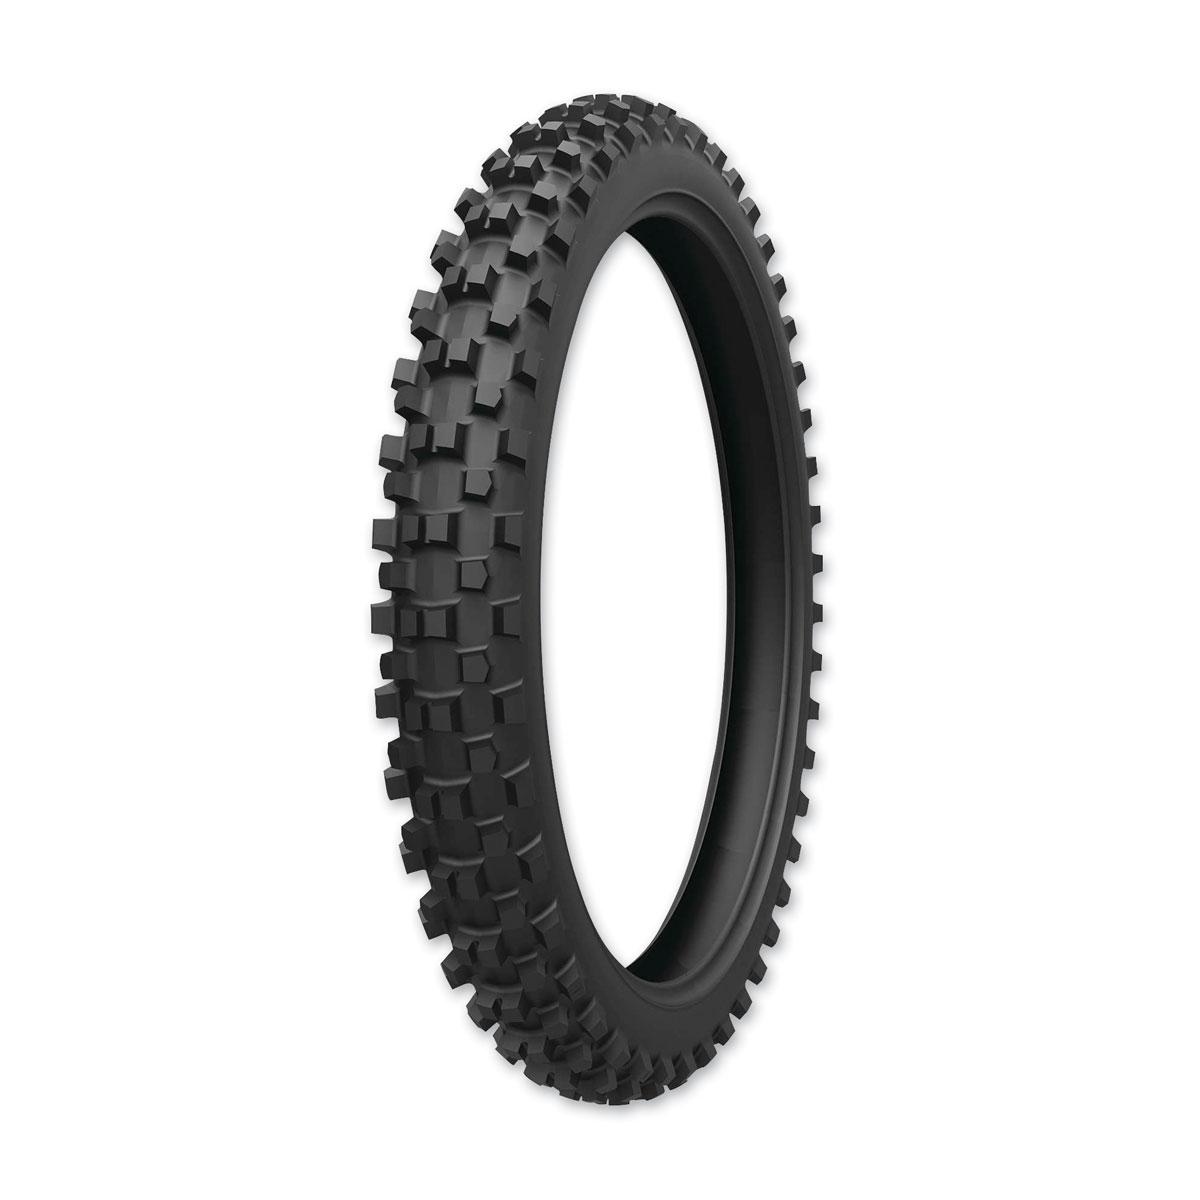 Kenda Tires Washougal II 2.50-10 Front Tire